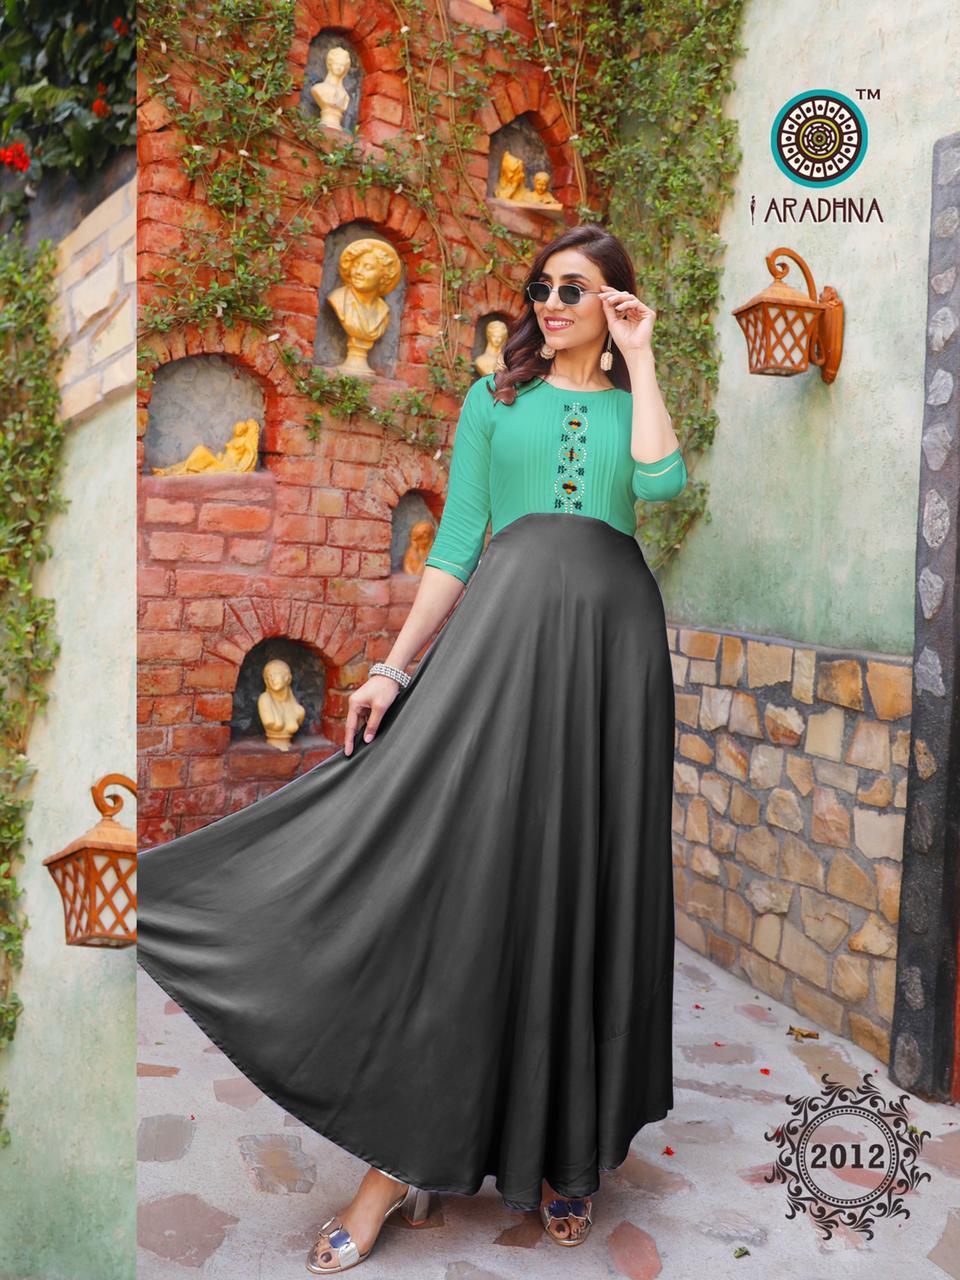 Aradhna Fashion Fabulous Vol 2 Kurti Wholesale Catalog 12 Pcs 15 - Aradhna Fashion Fabulous Vol 2 Kurti Wholesale Catalog 12 Pcs